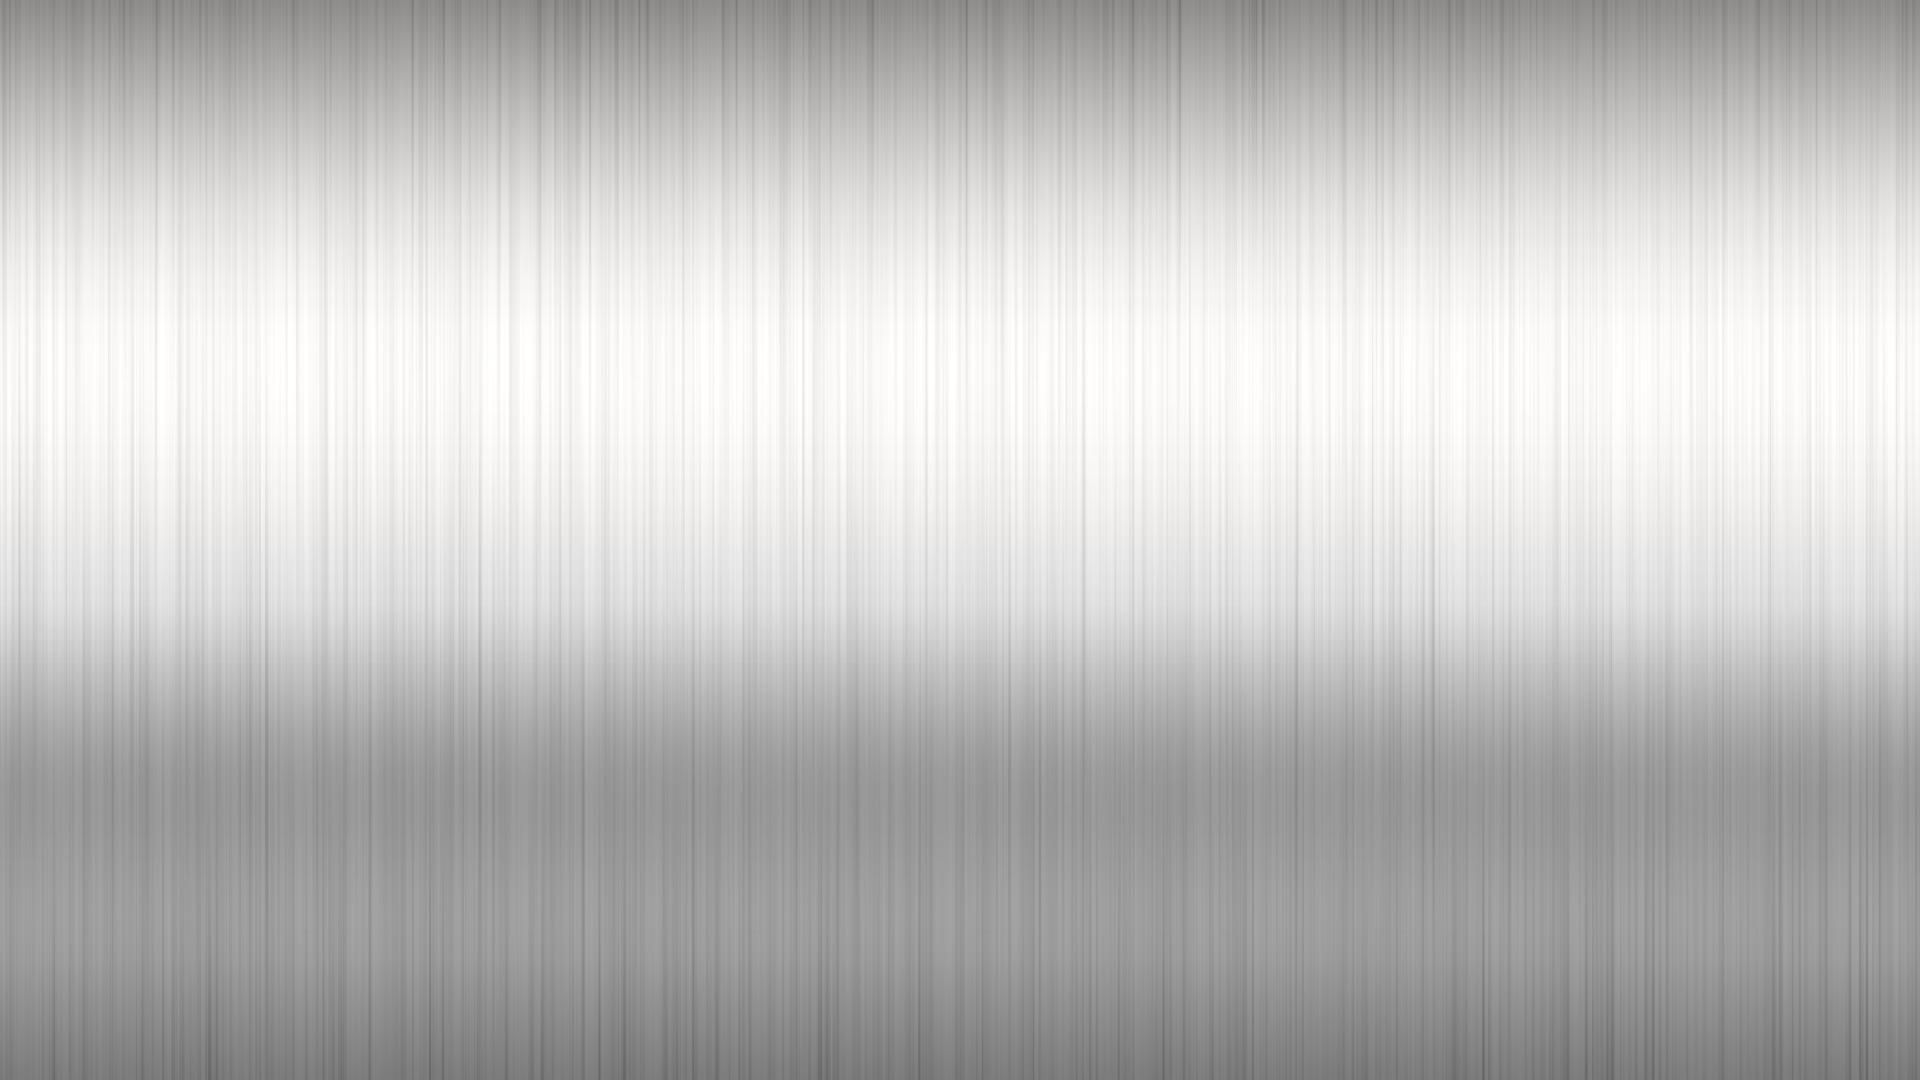 BrushedMetal1.png (PNG Image, 1920 × 1080 pixels) 그래픽